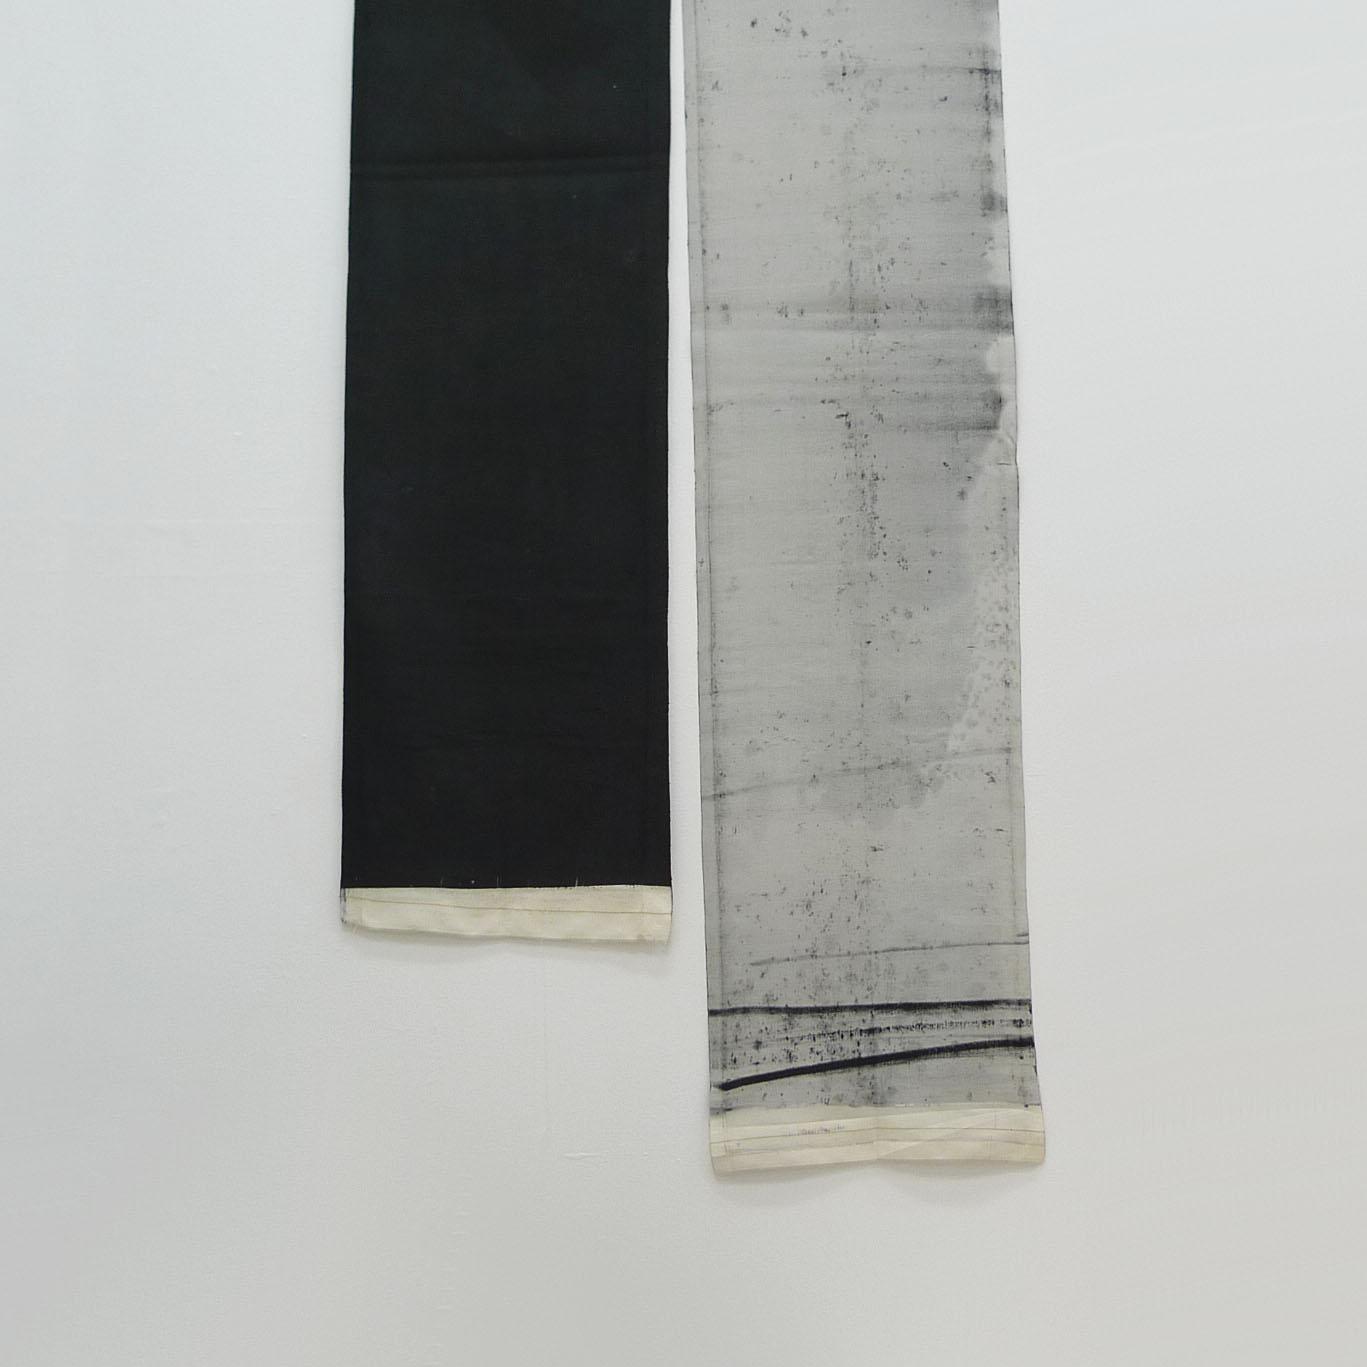 P1120804